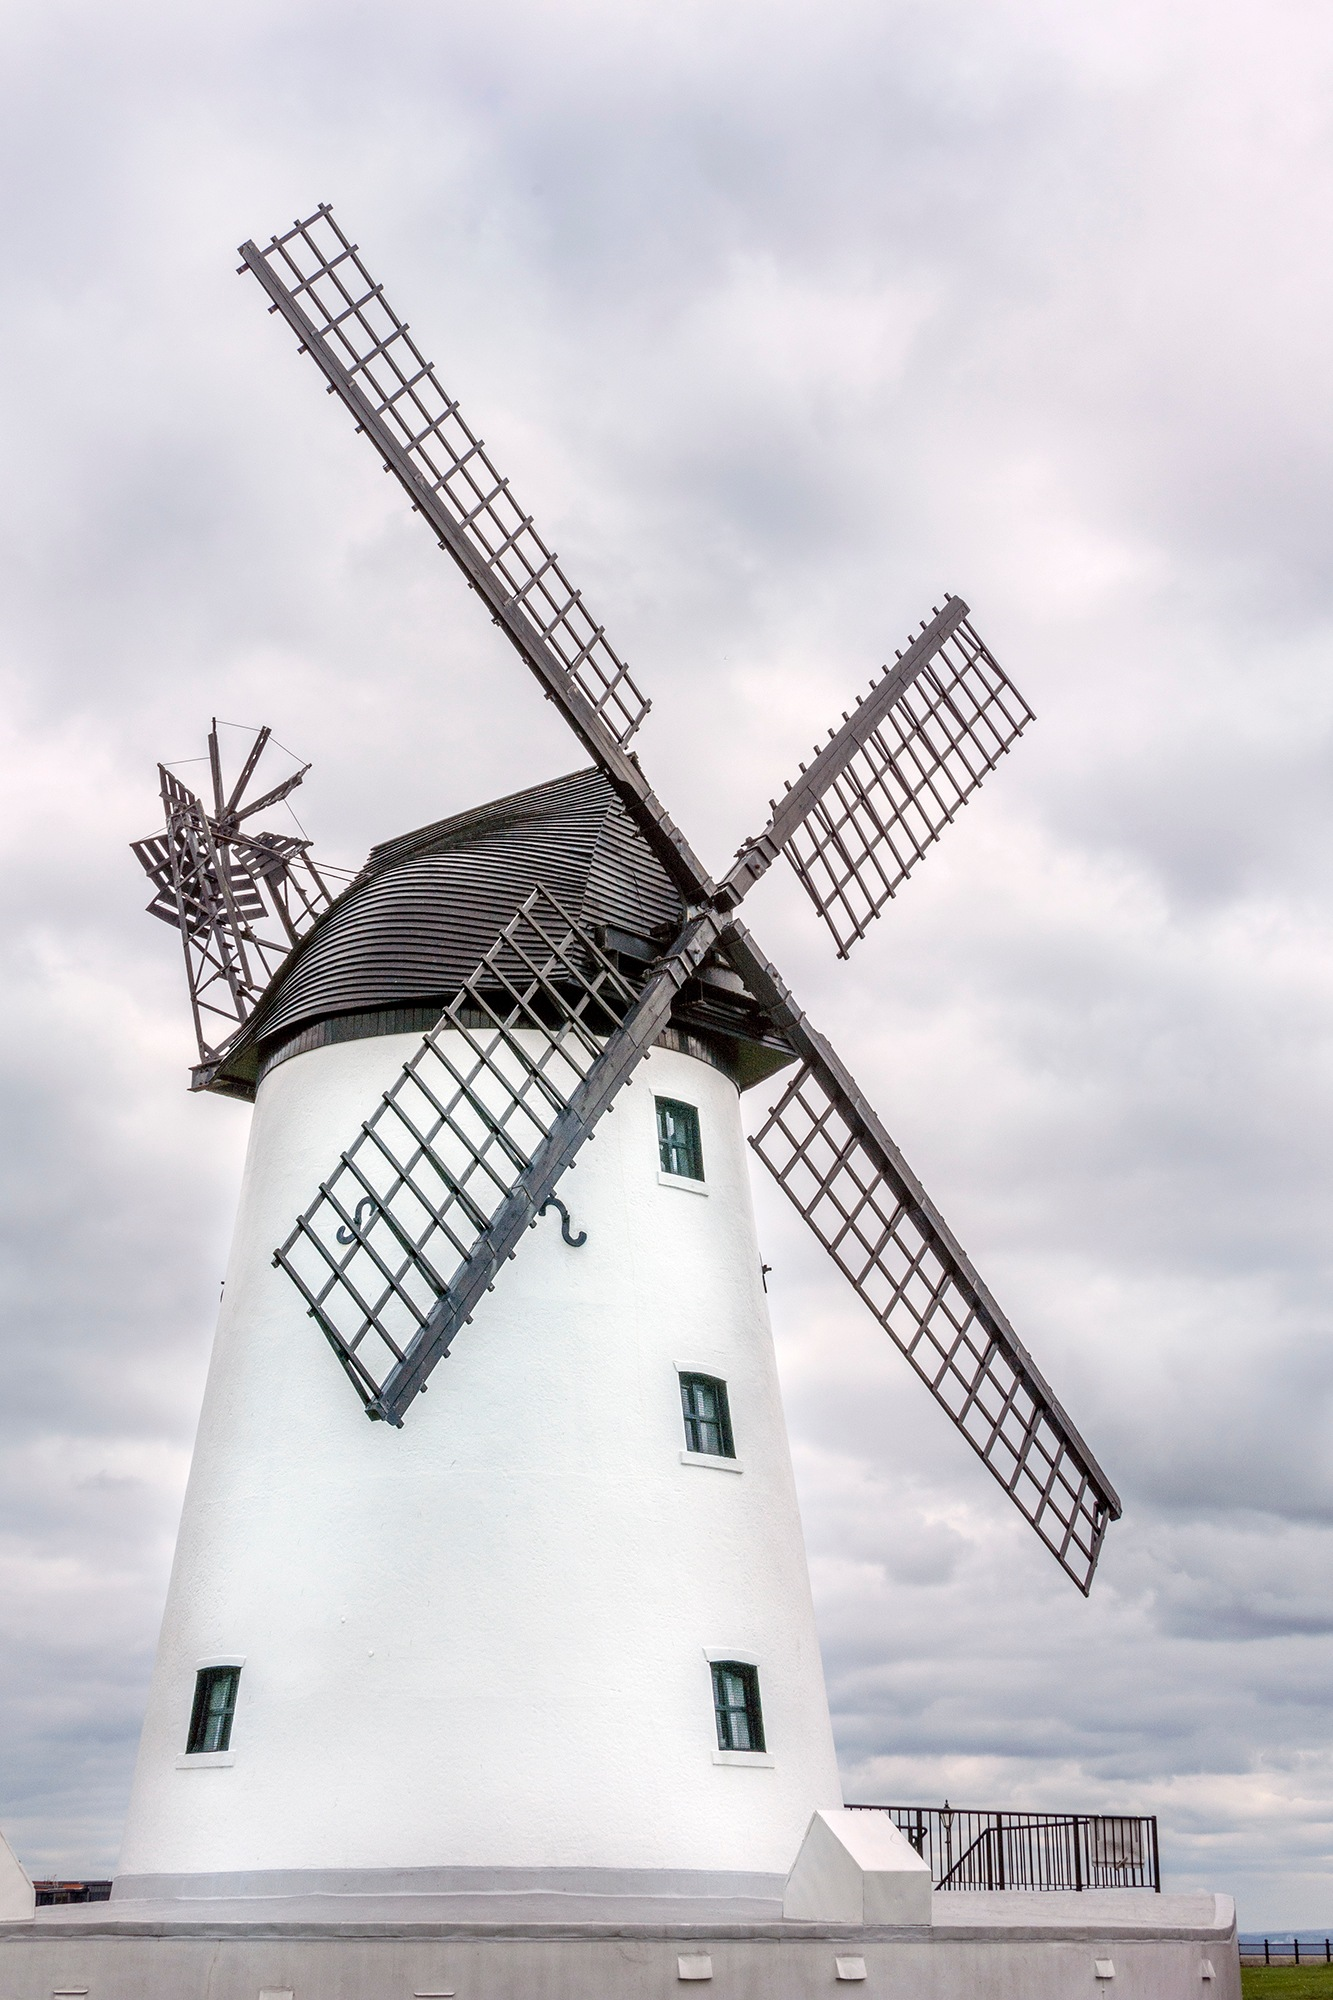 Windmill by Ian M